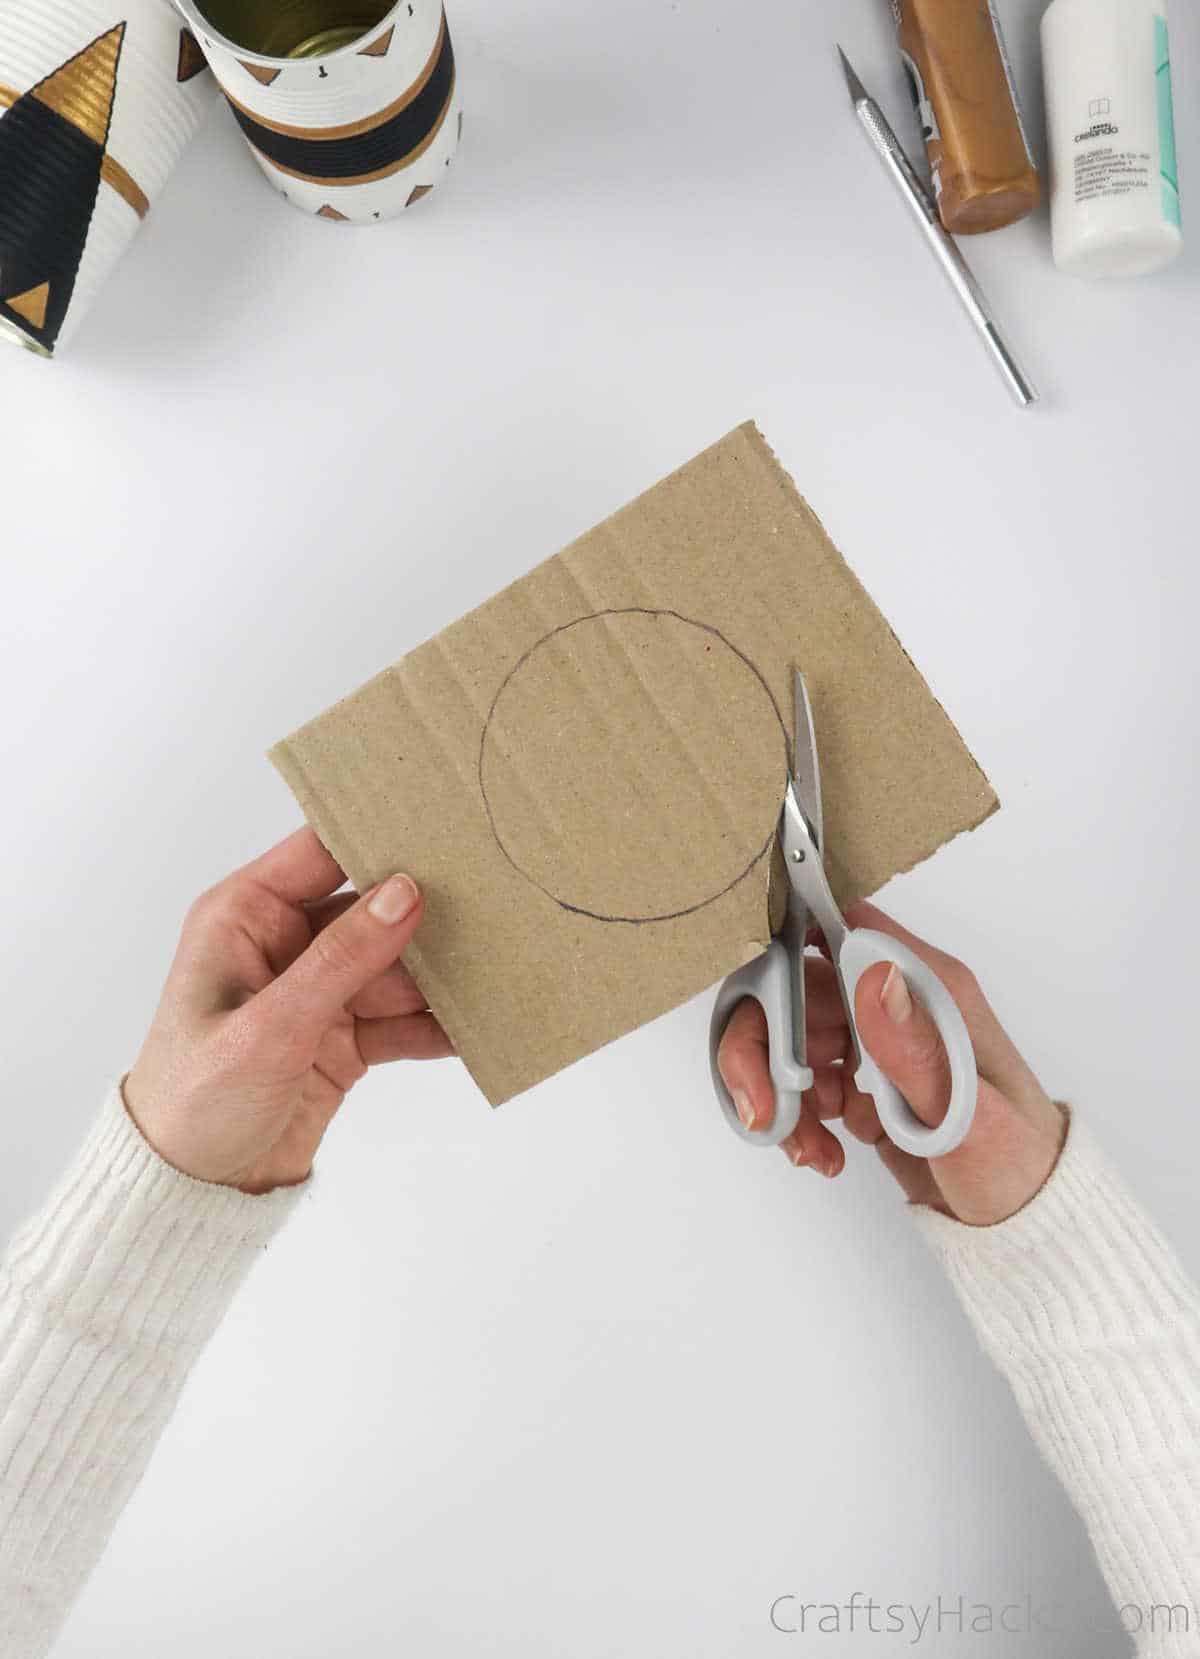 cutting out cardboard circle